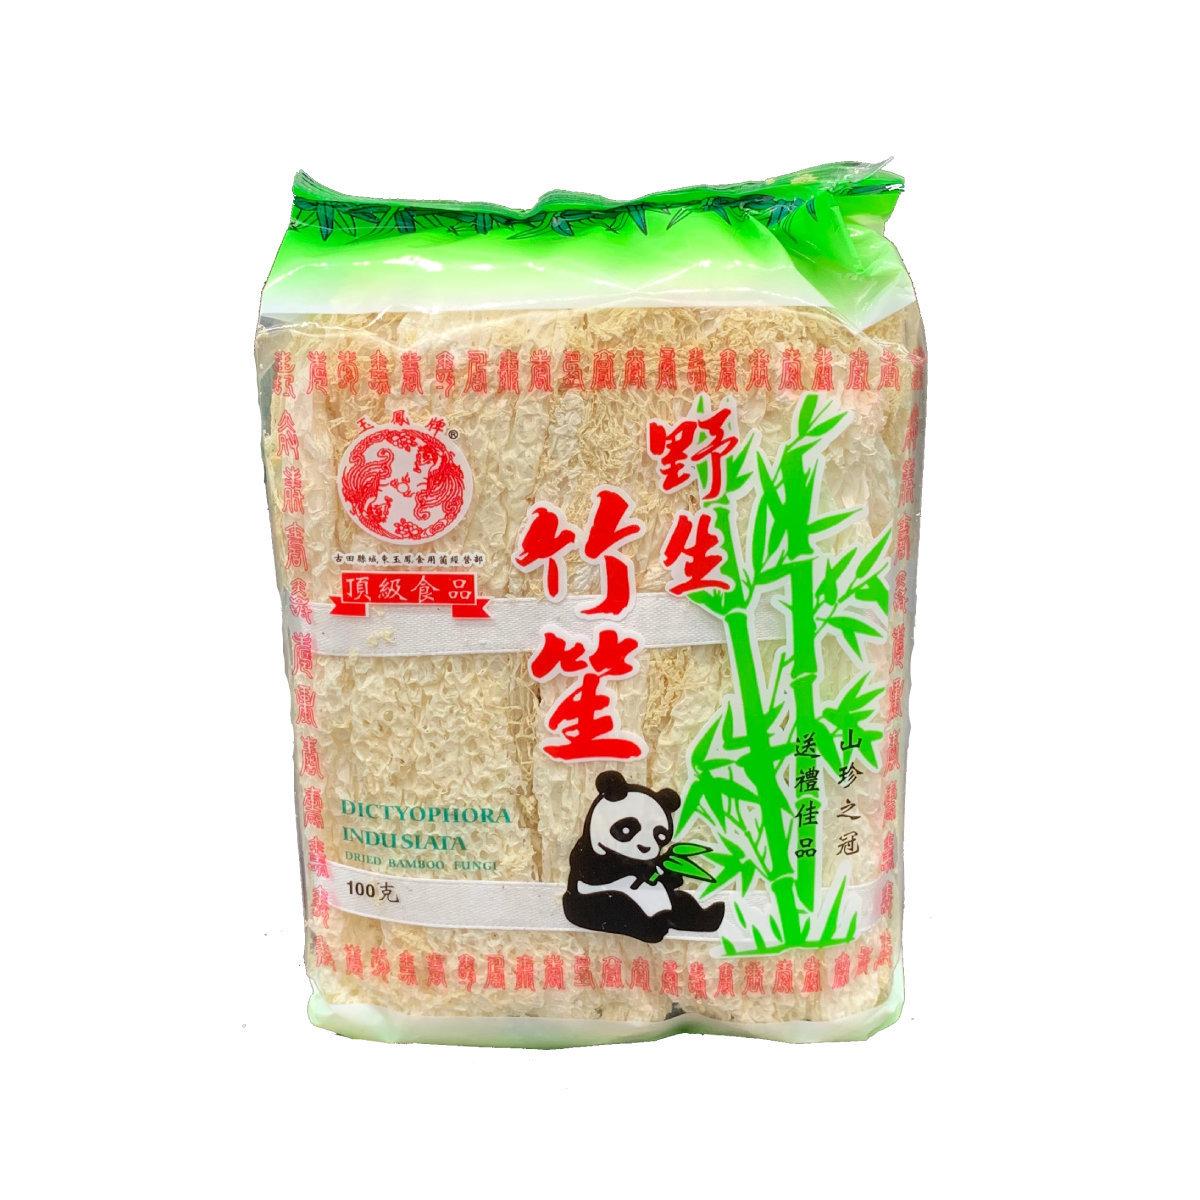 Bamboo Fungus